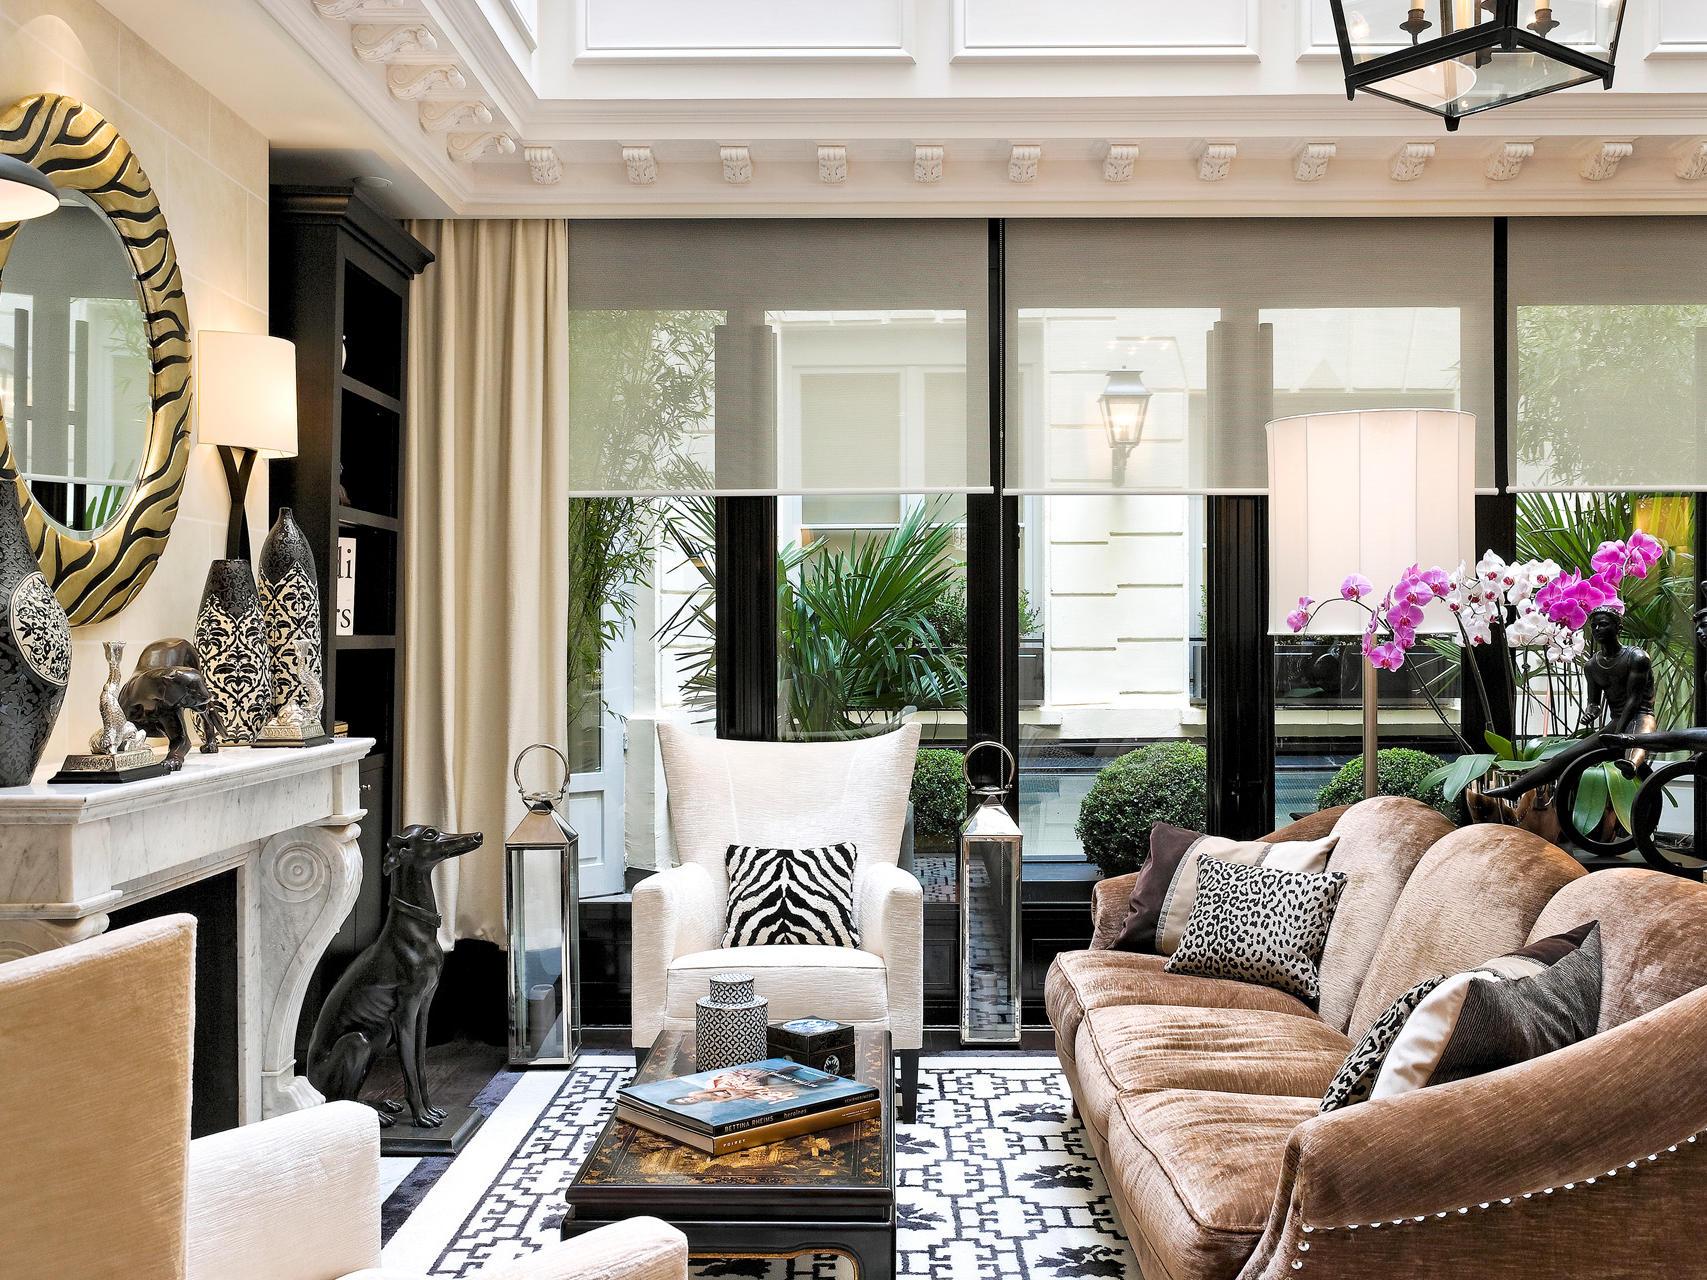 Living room area at Hotel Keppler Paris.